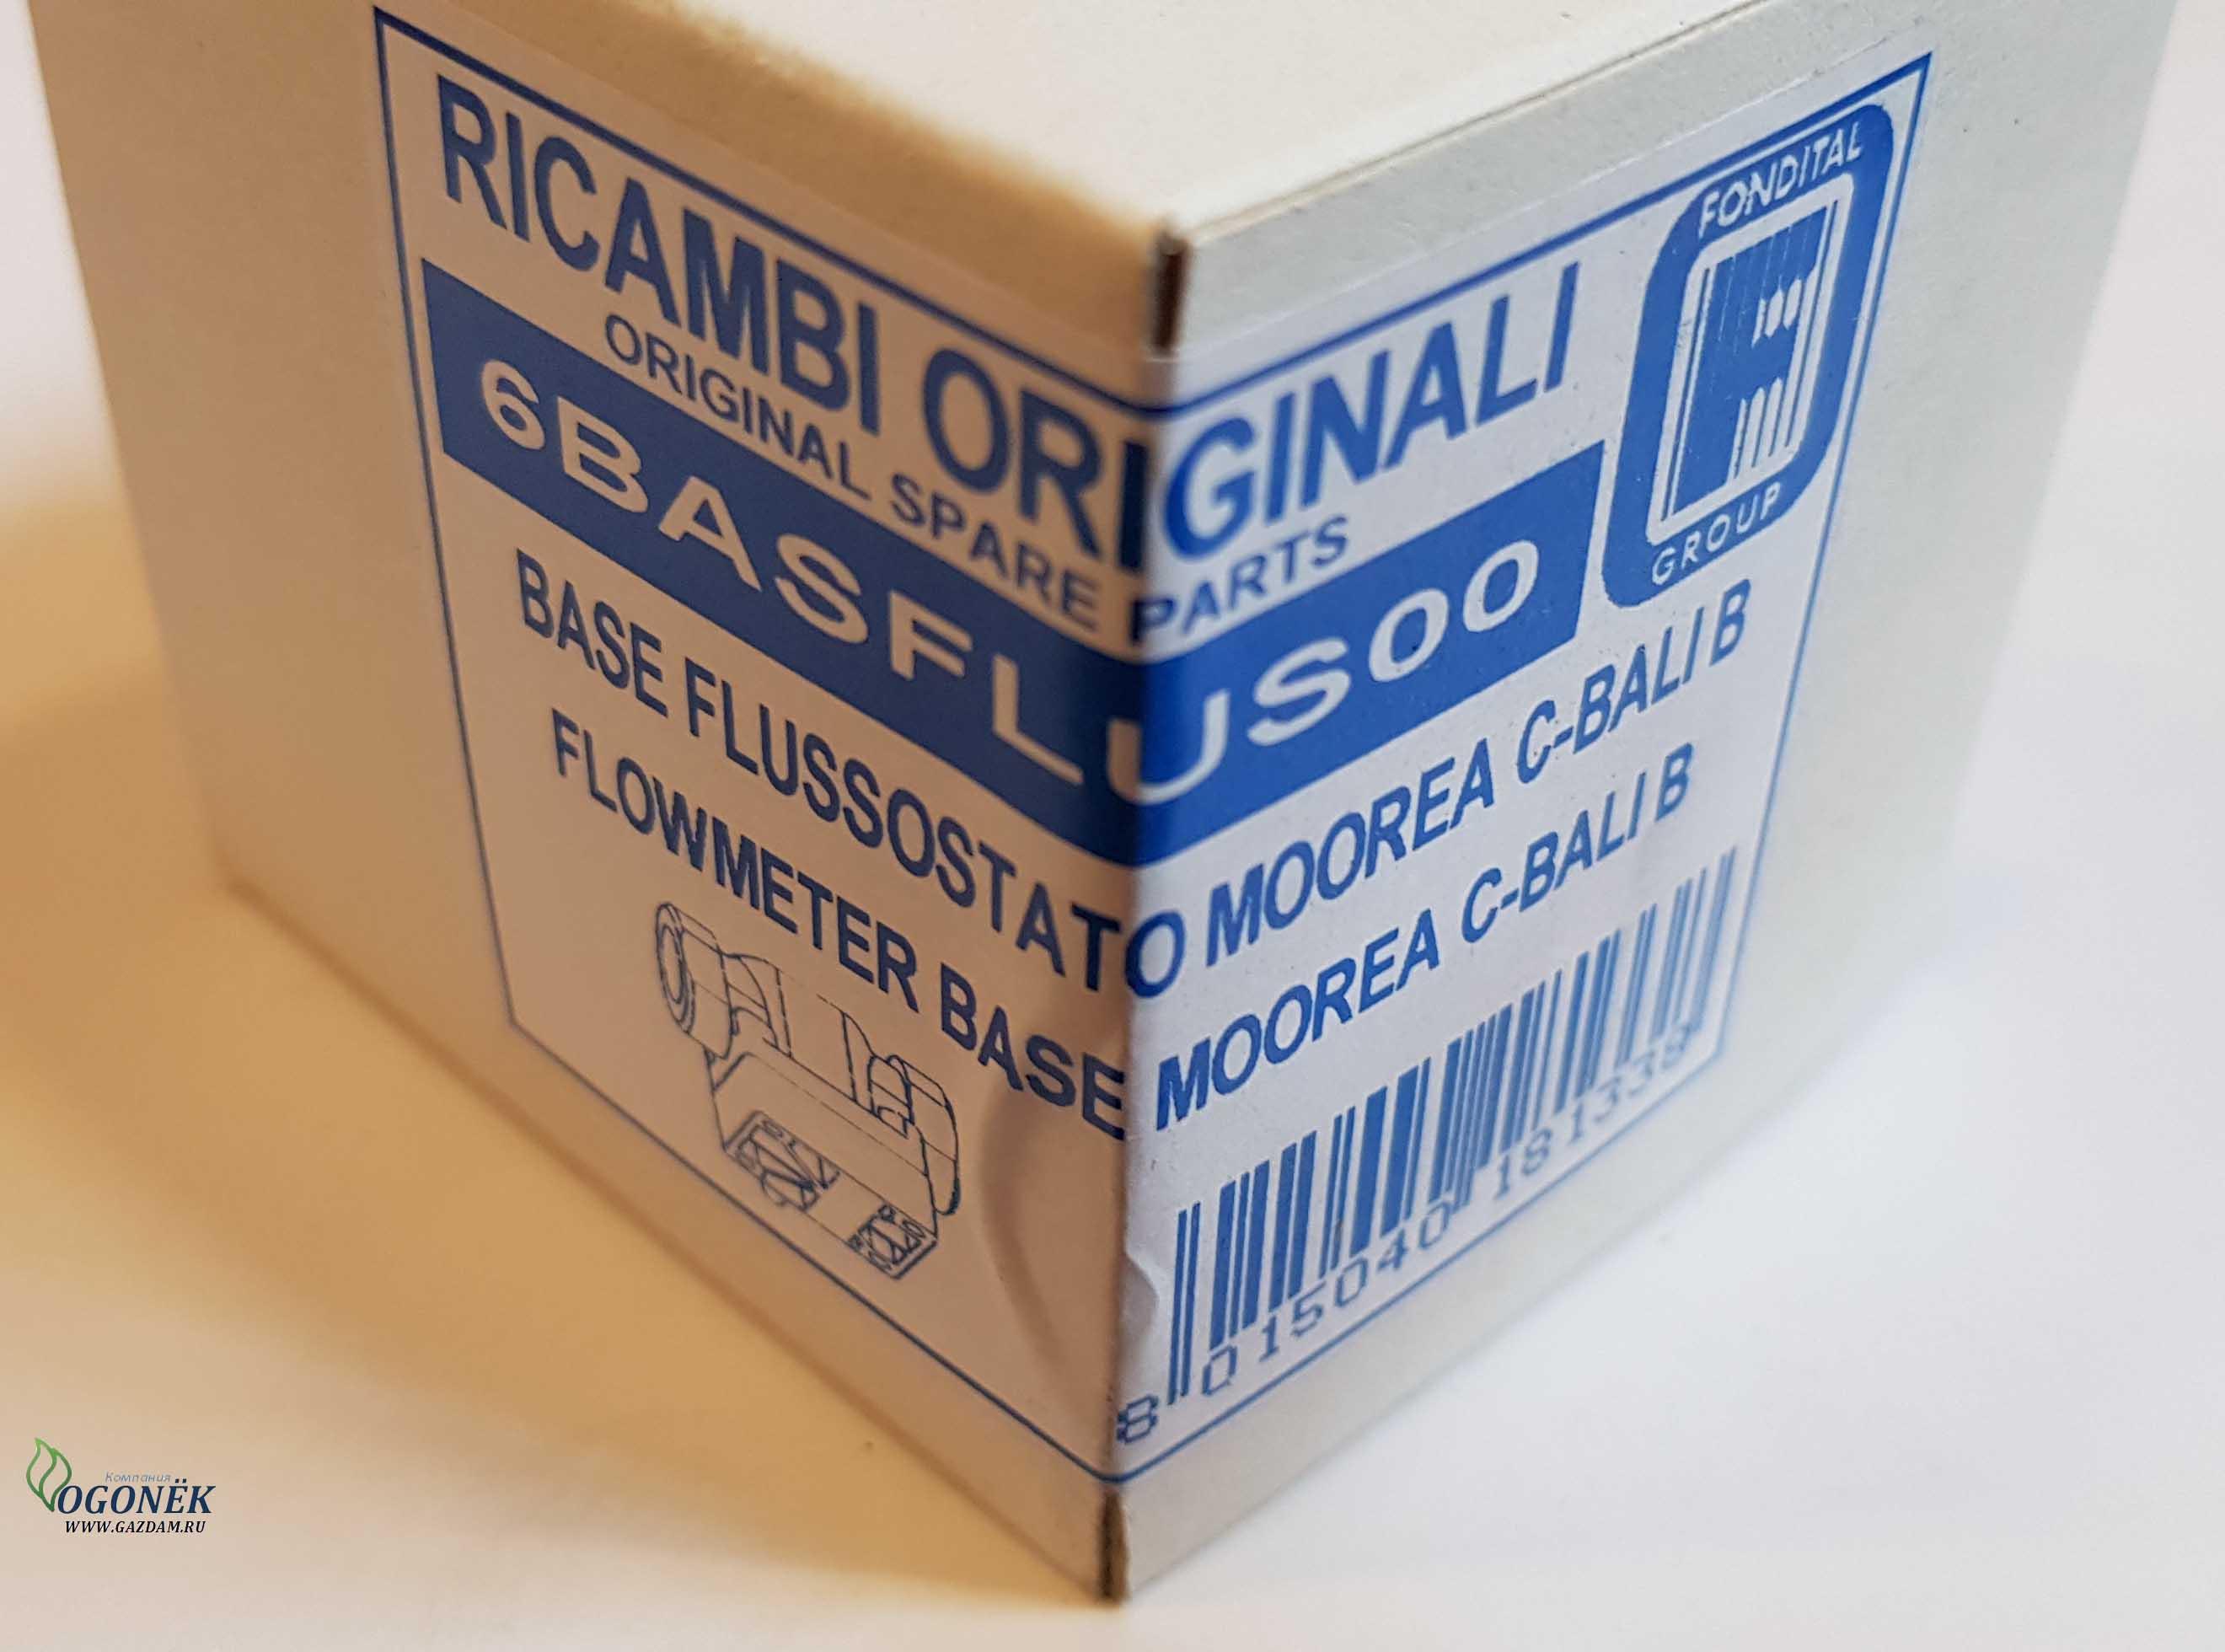 6BASFLUS00  РЕЛЕ ПРОТОКА ГОРЯЧЕЙ ВОДА  MOOREA C-BALI B  BASE FLUSSOSTATO MOOREA C-BALI B(R)